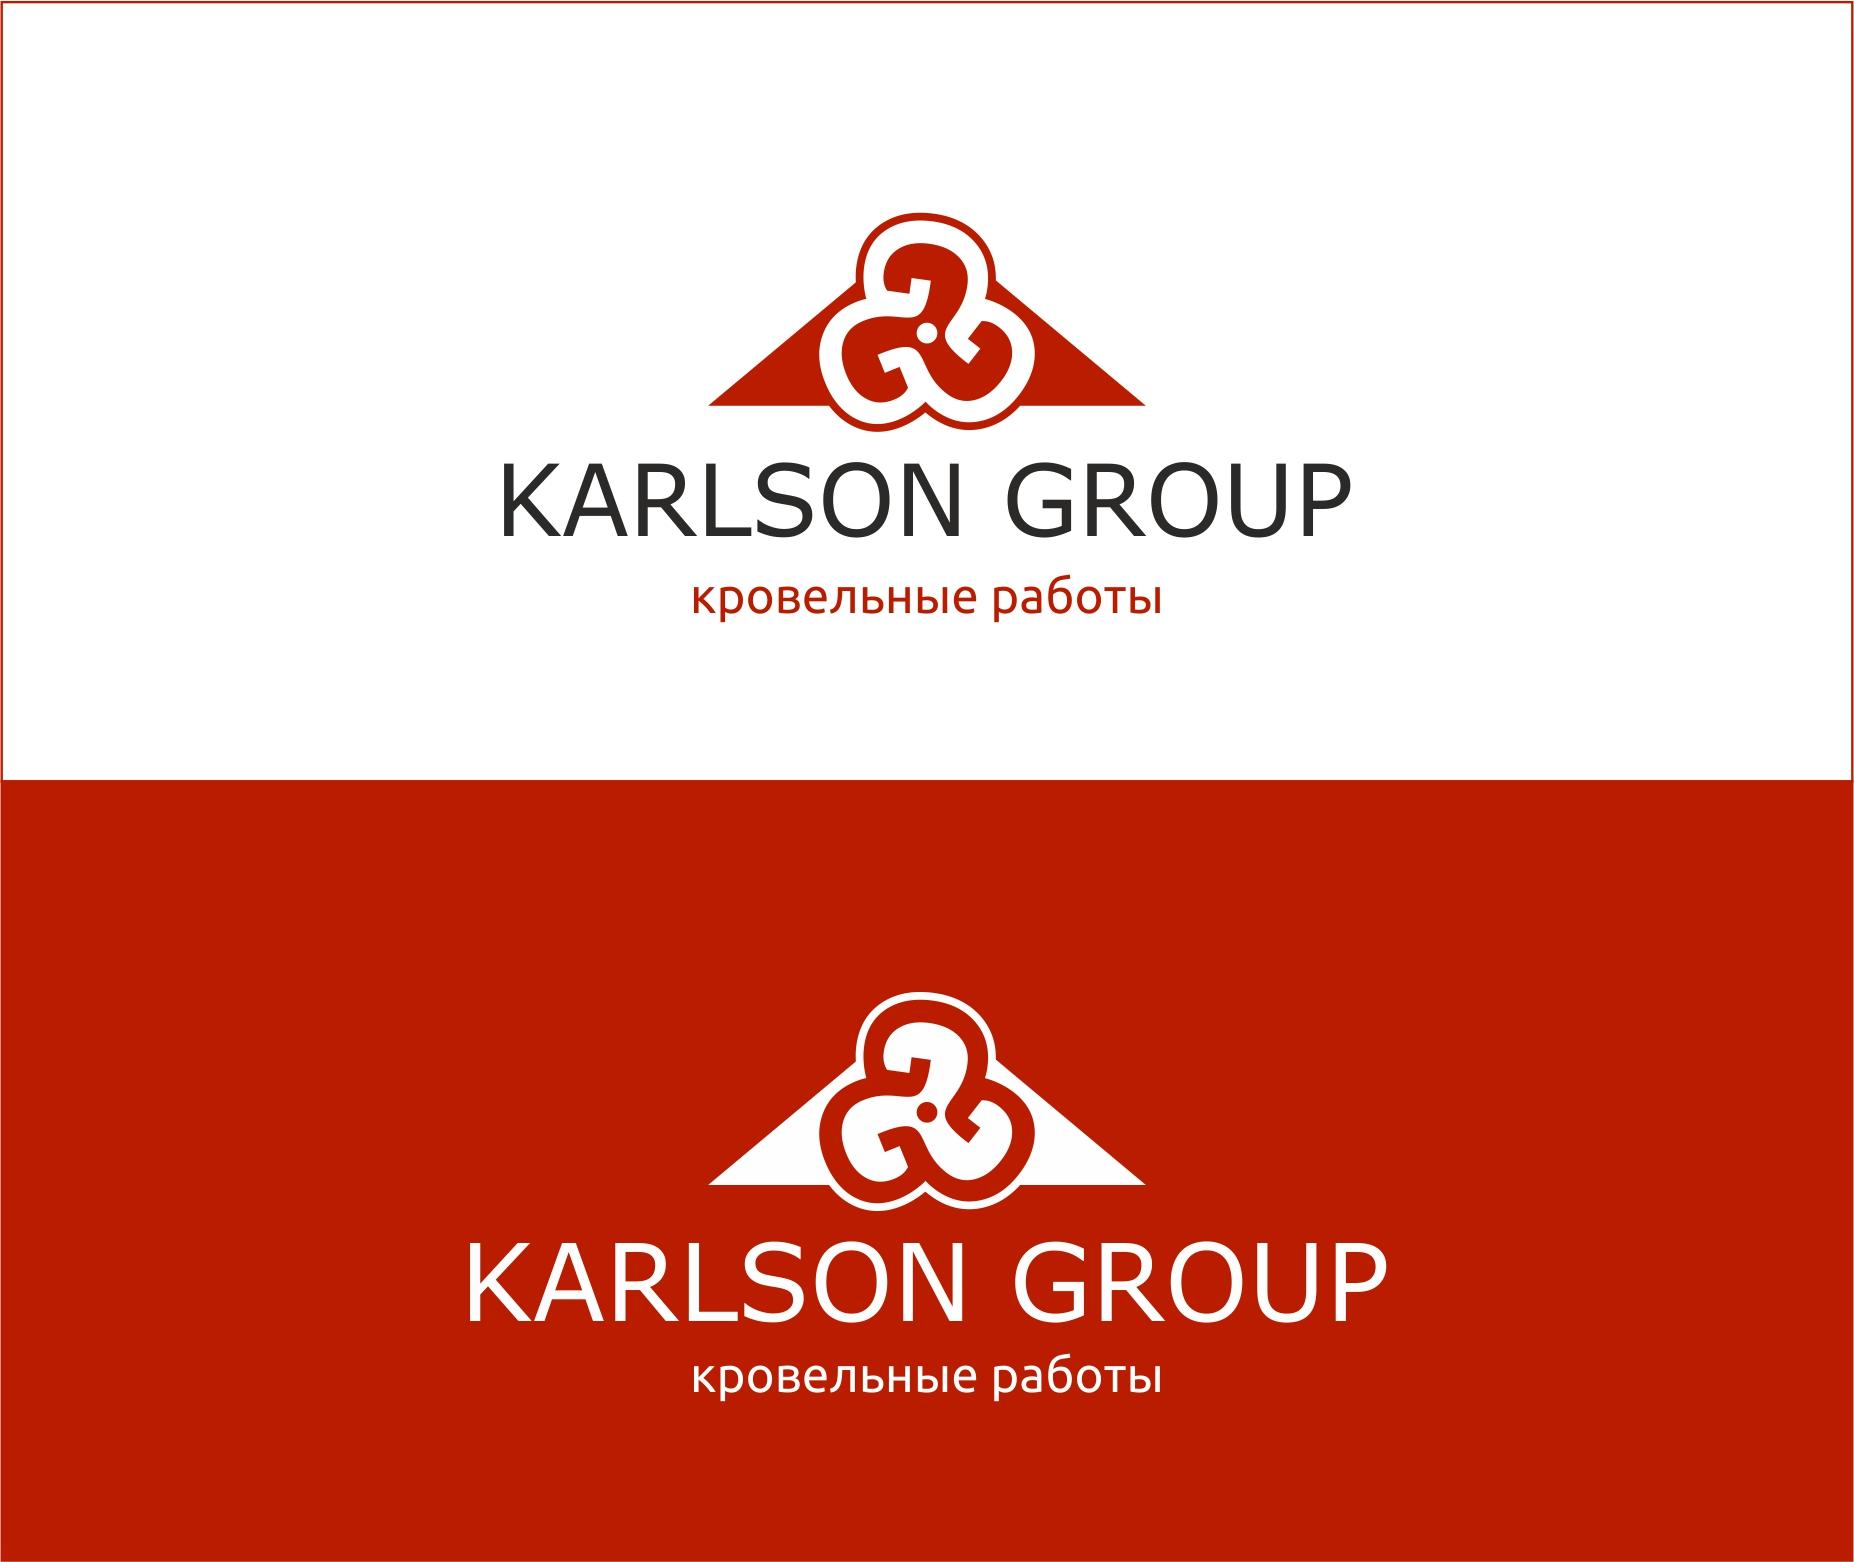 Придумать классный логотип фото f_045598ed2796a0ed.jpg